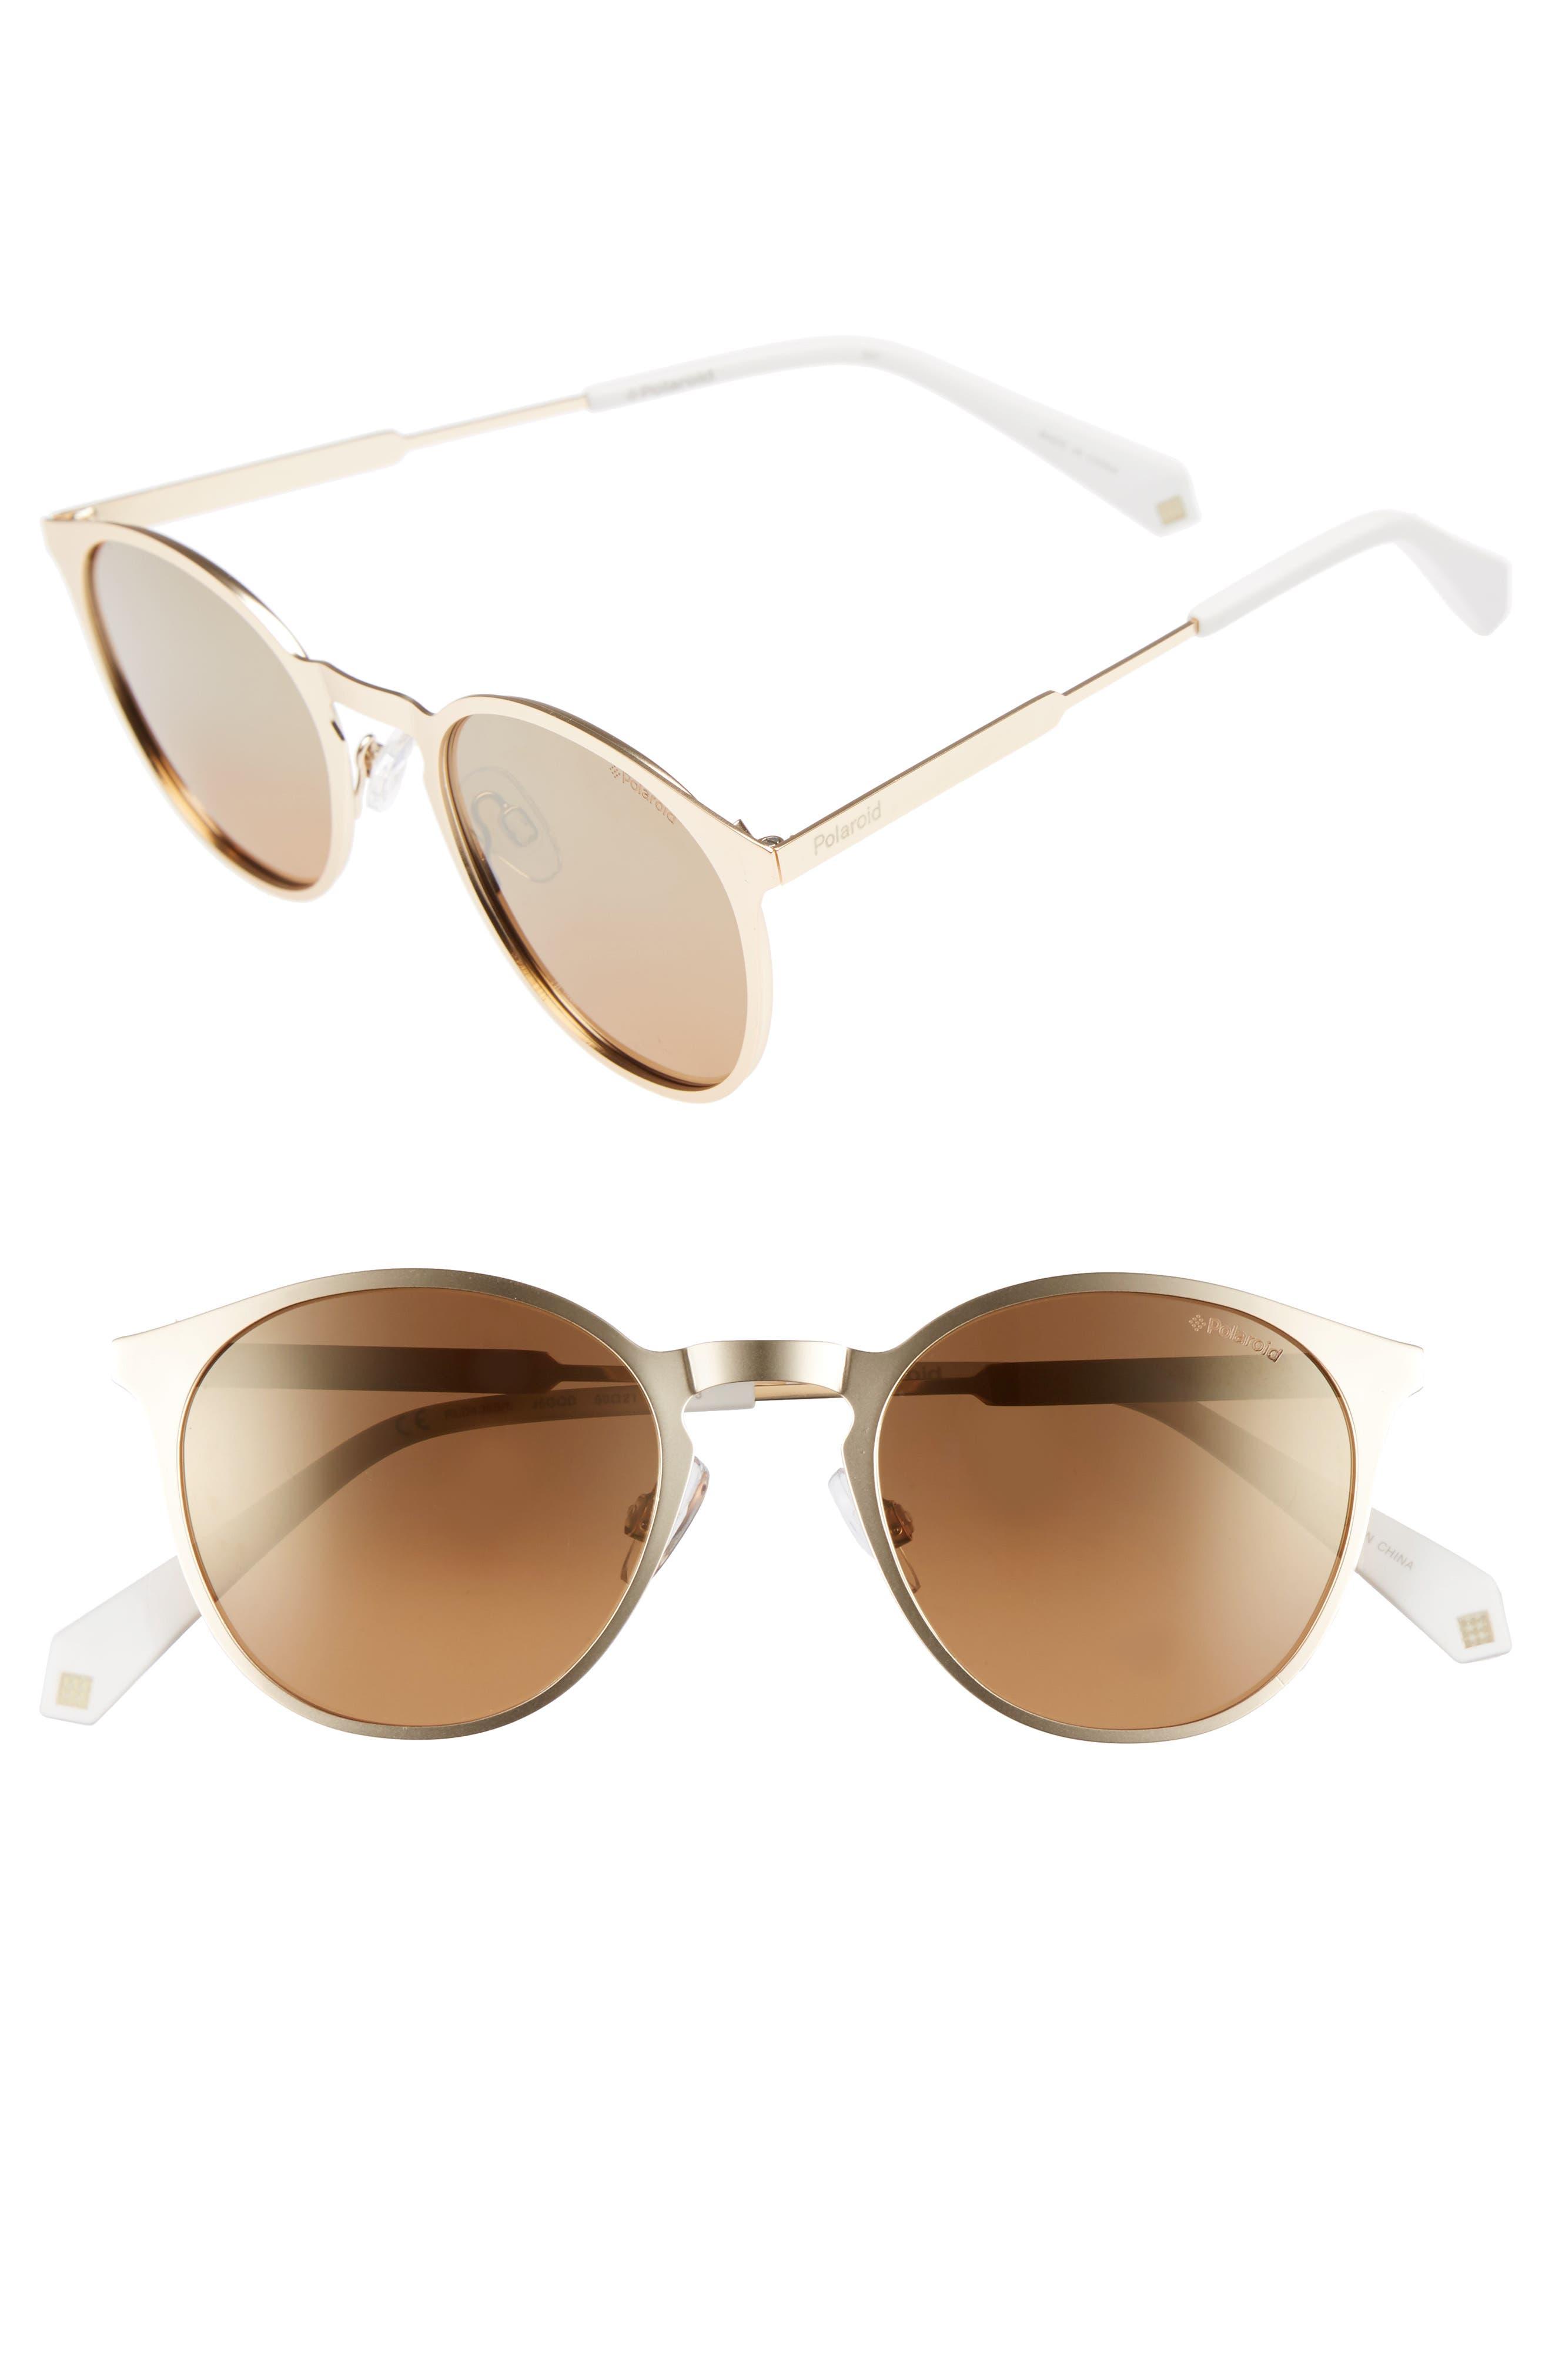 50mm Round Polarized Sunglasses,                             Main thumbnail 1, color,                             GOLD